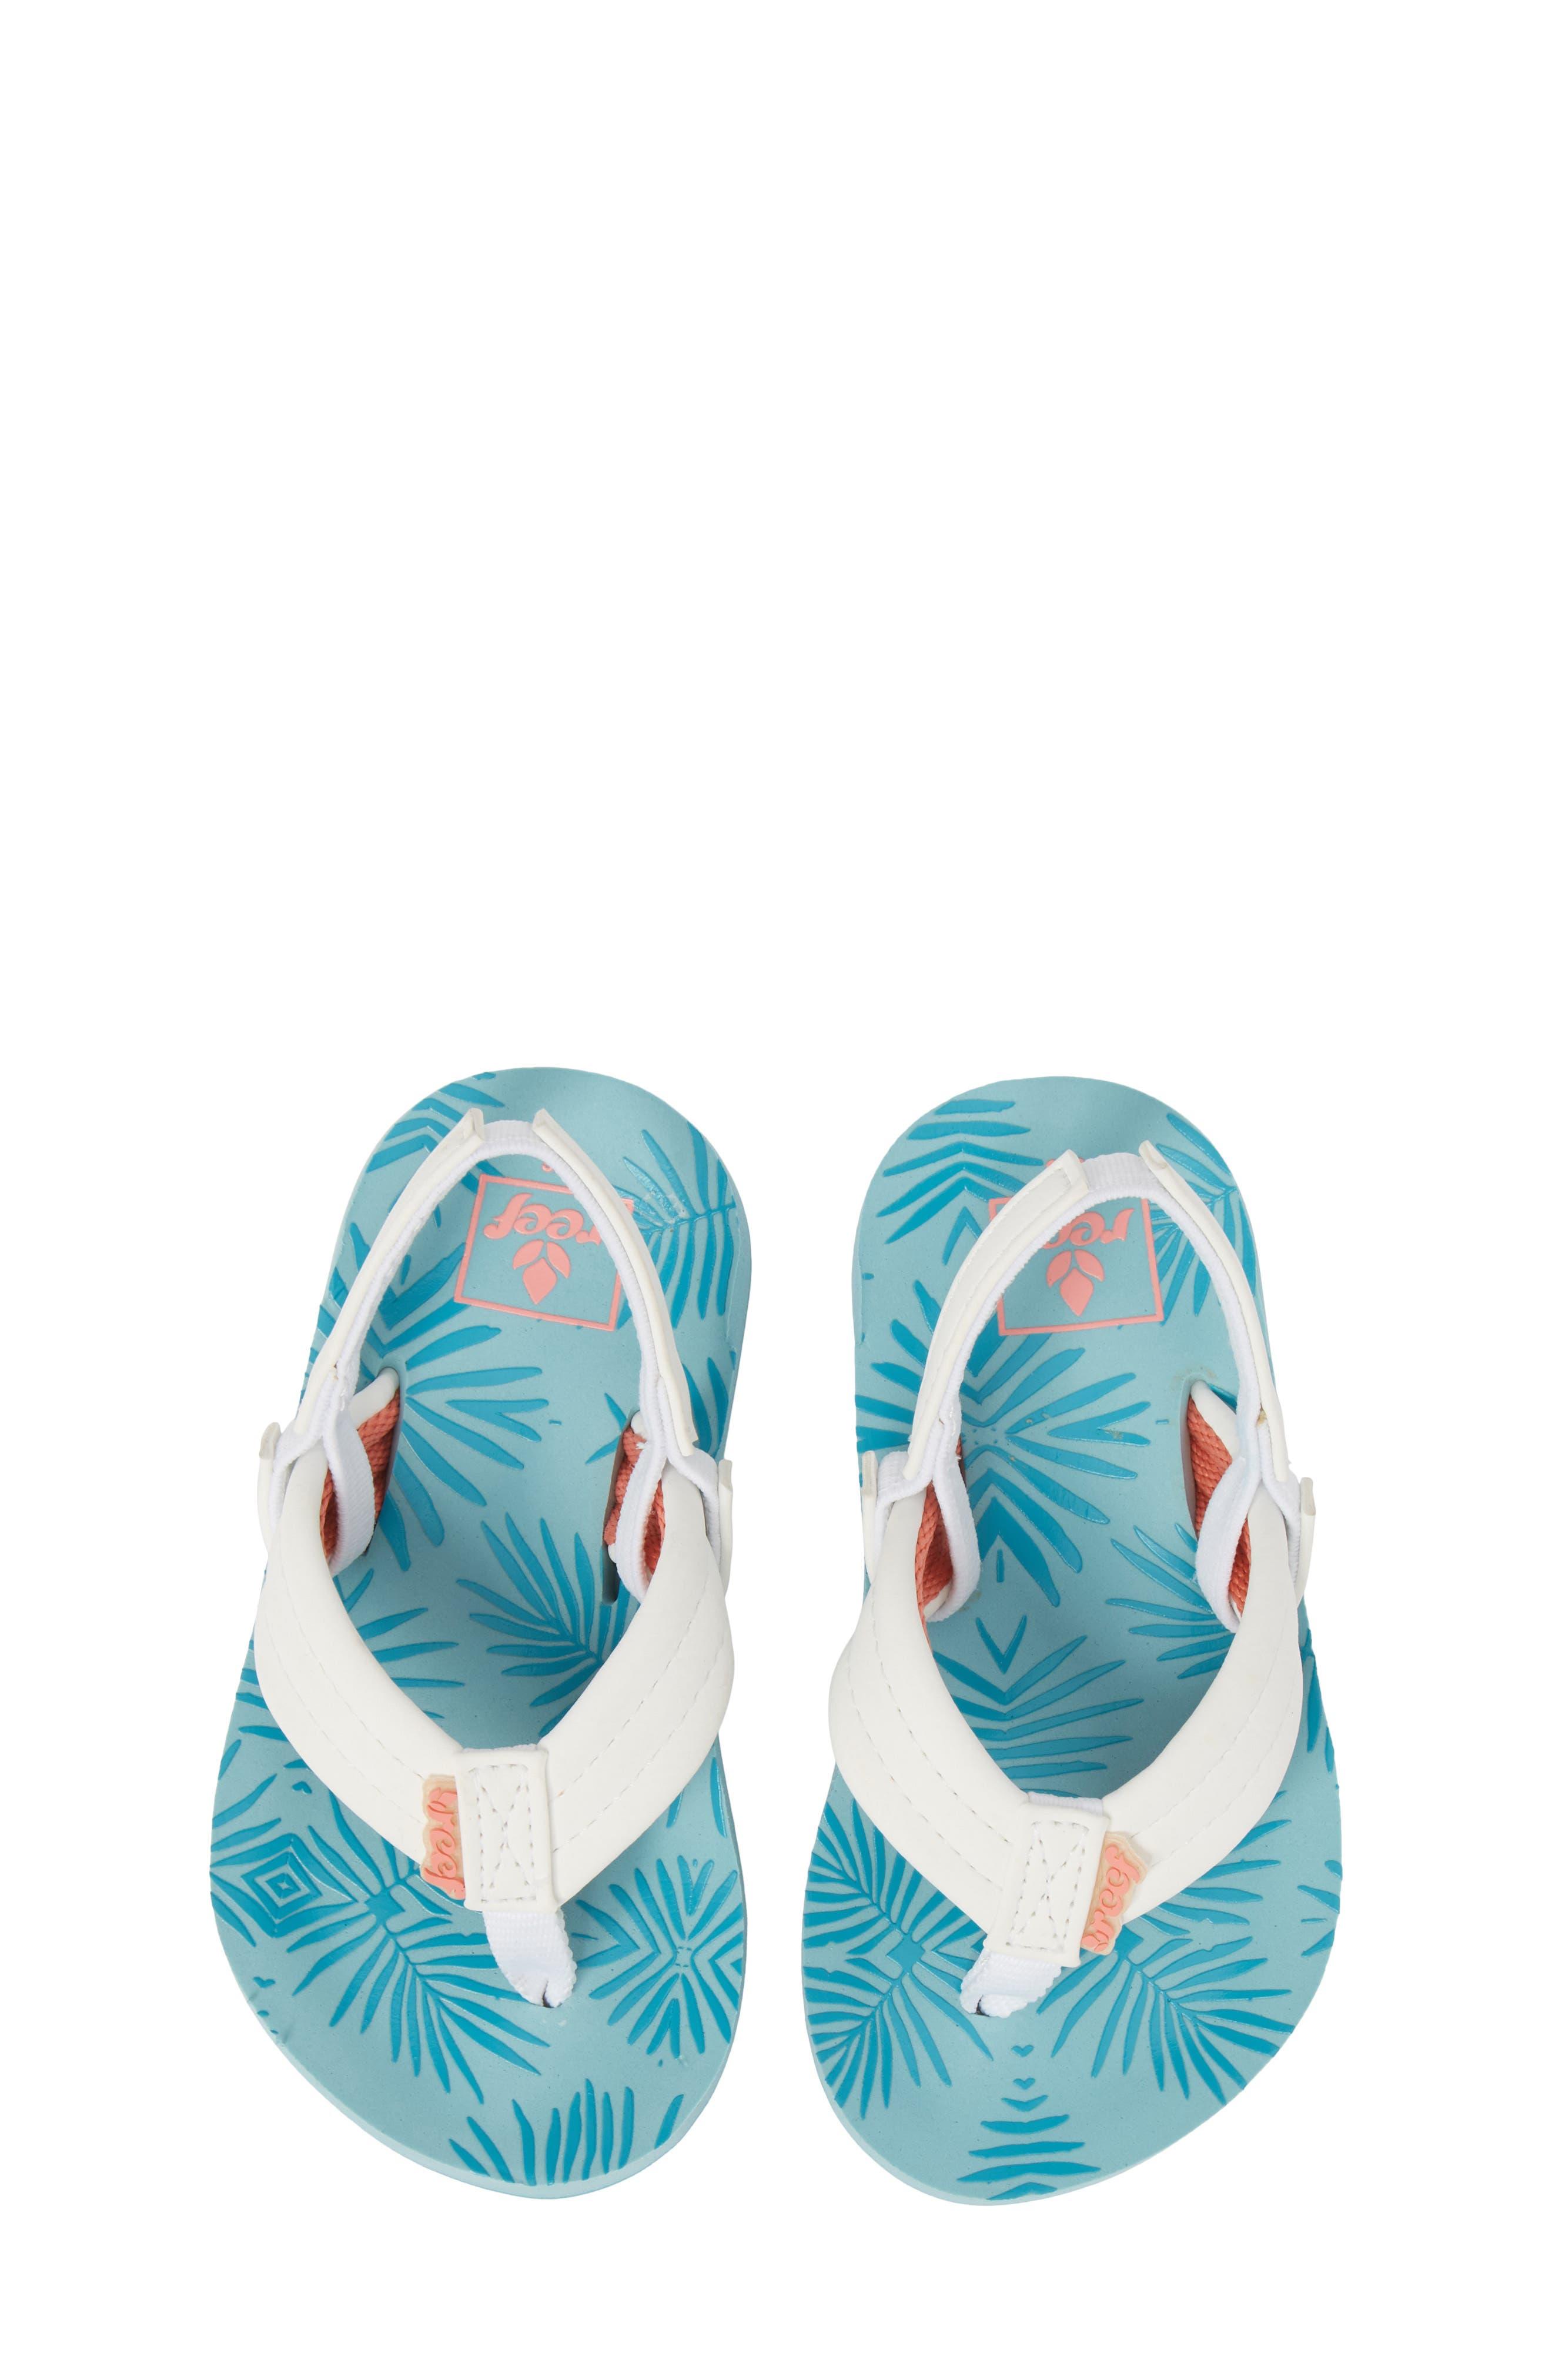 Little Reef Footprints Sandal,                         Main,                         color, 403